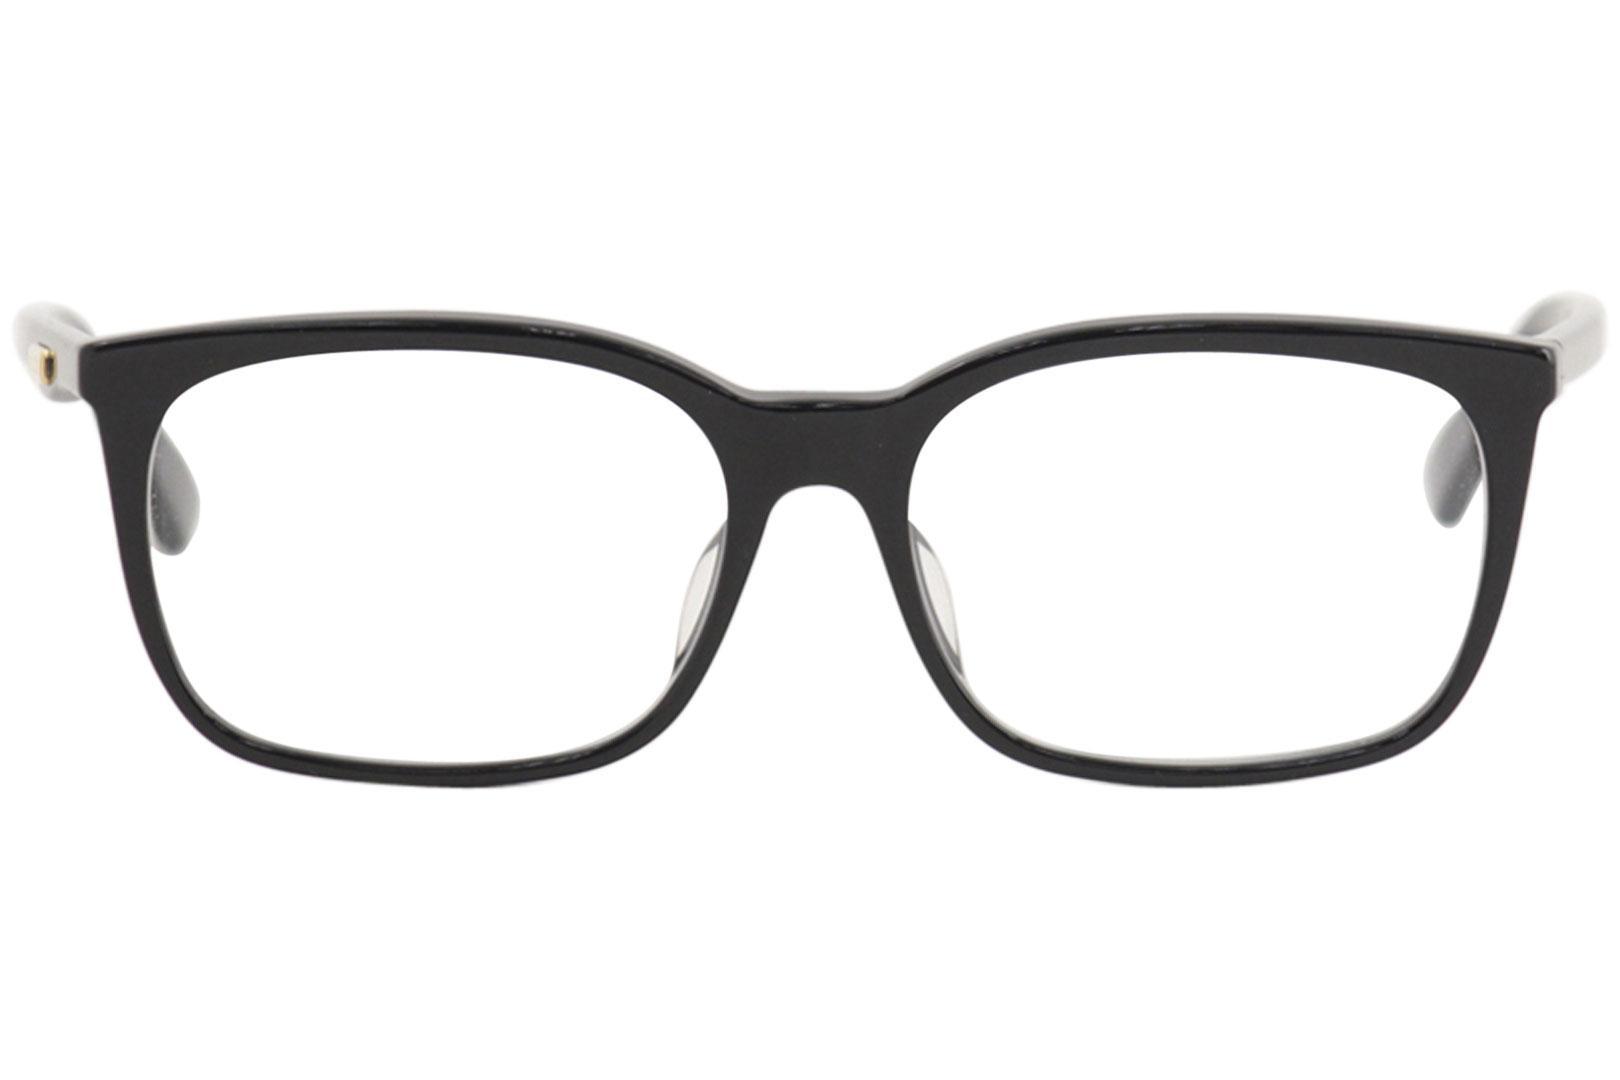 19be3143b78c Gucci Men's Eyeglasses Urban GG0333OA GG/0333/OA Optical Frame by Gucci.  1234